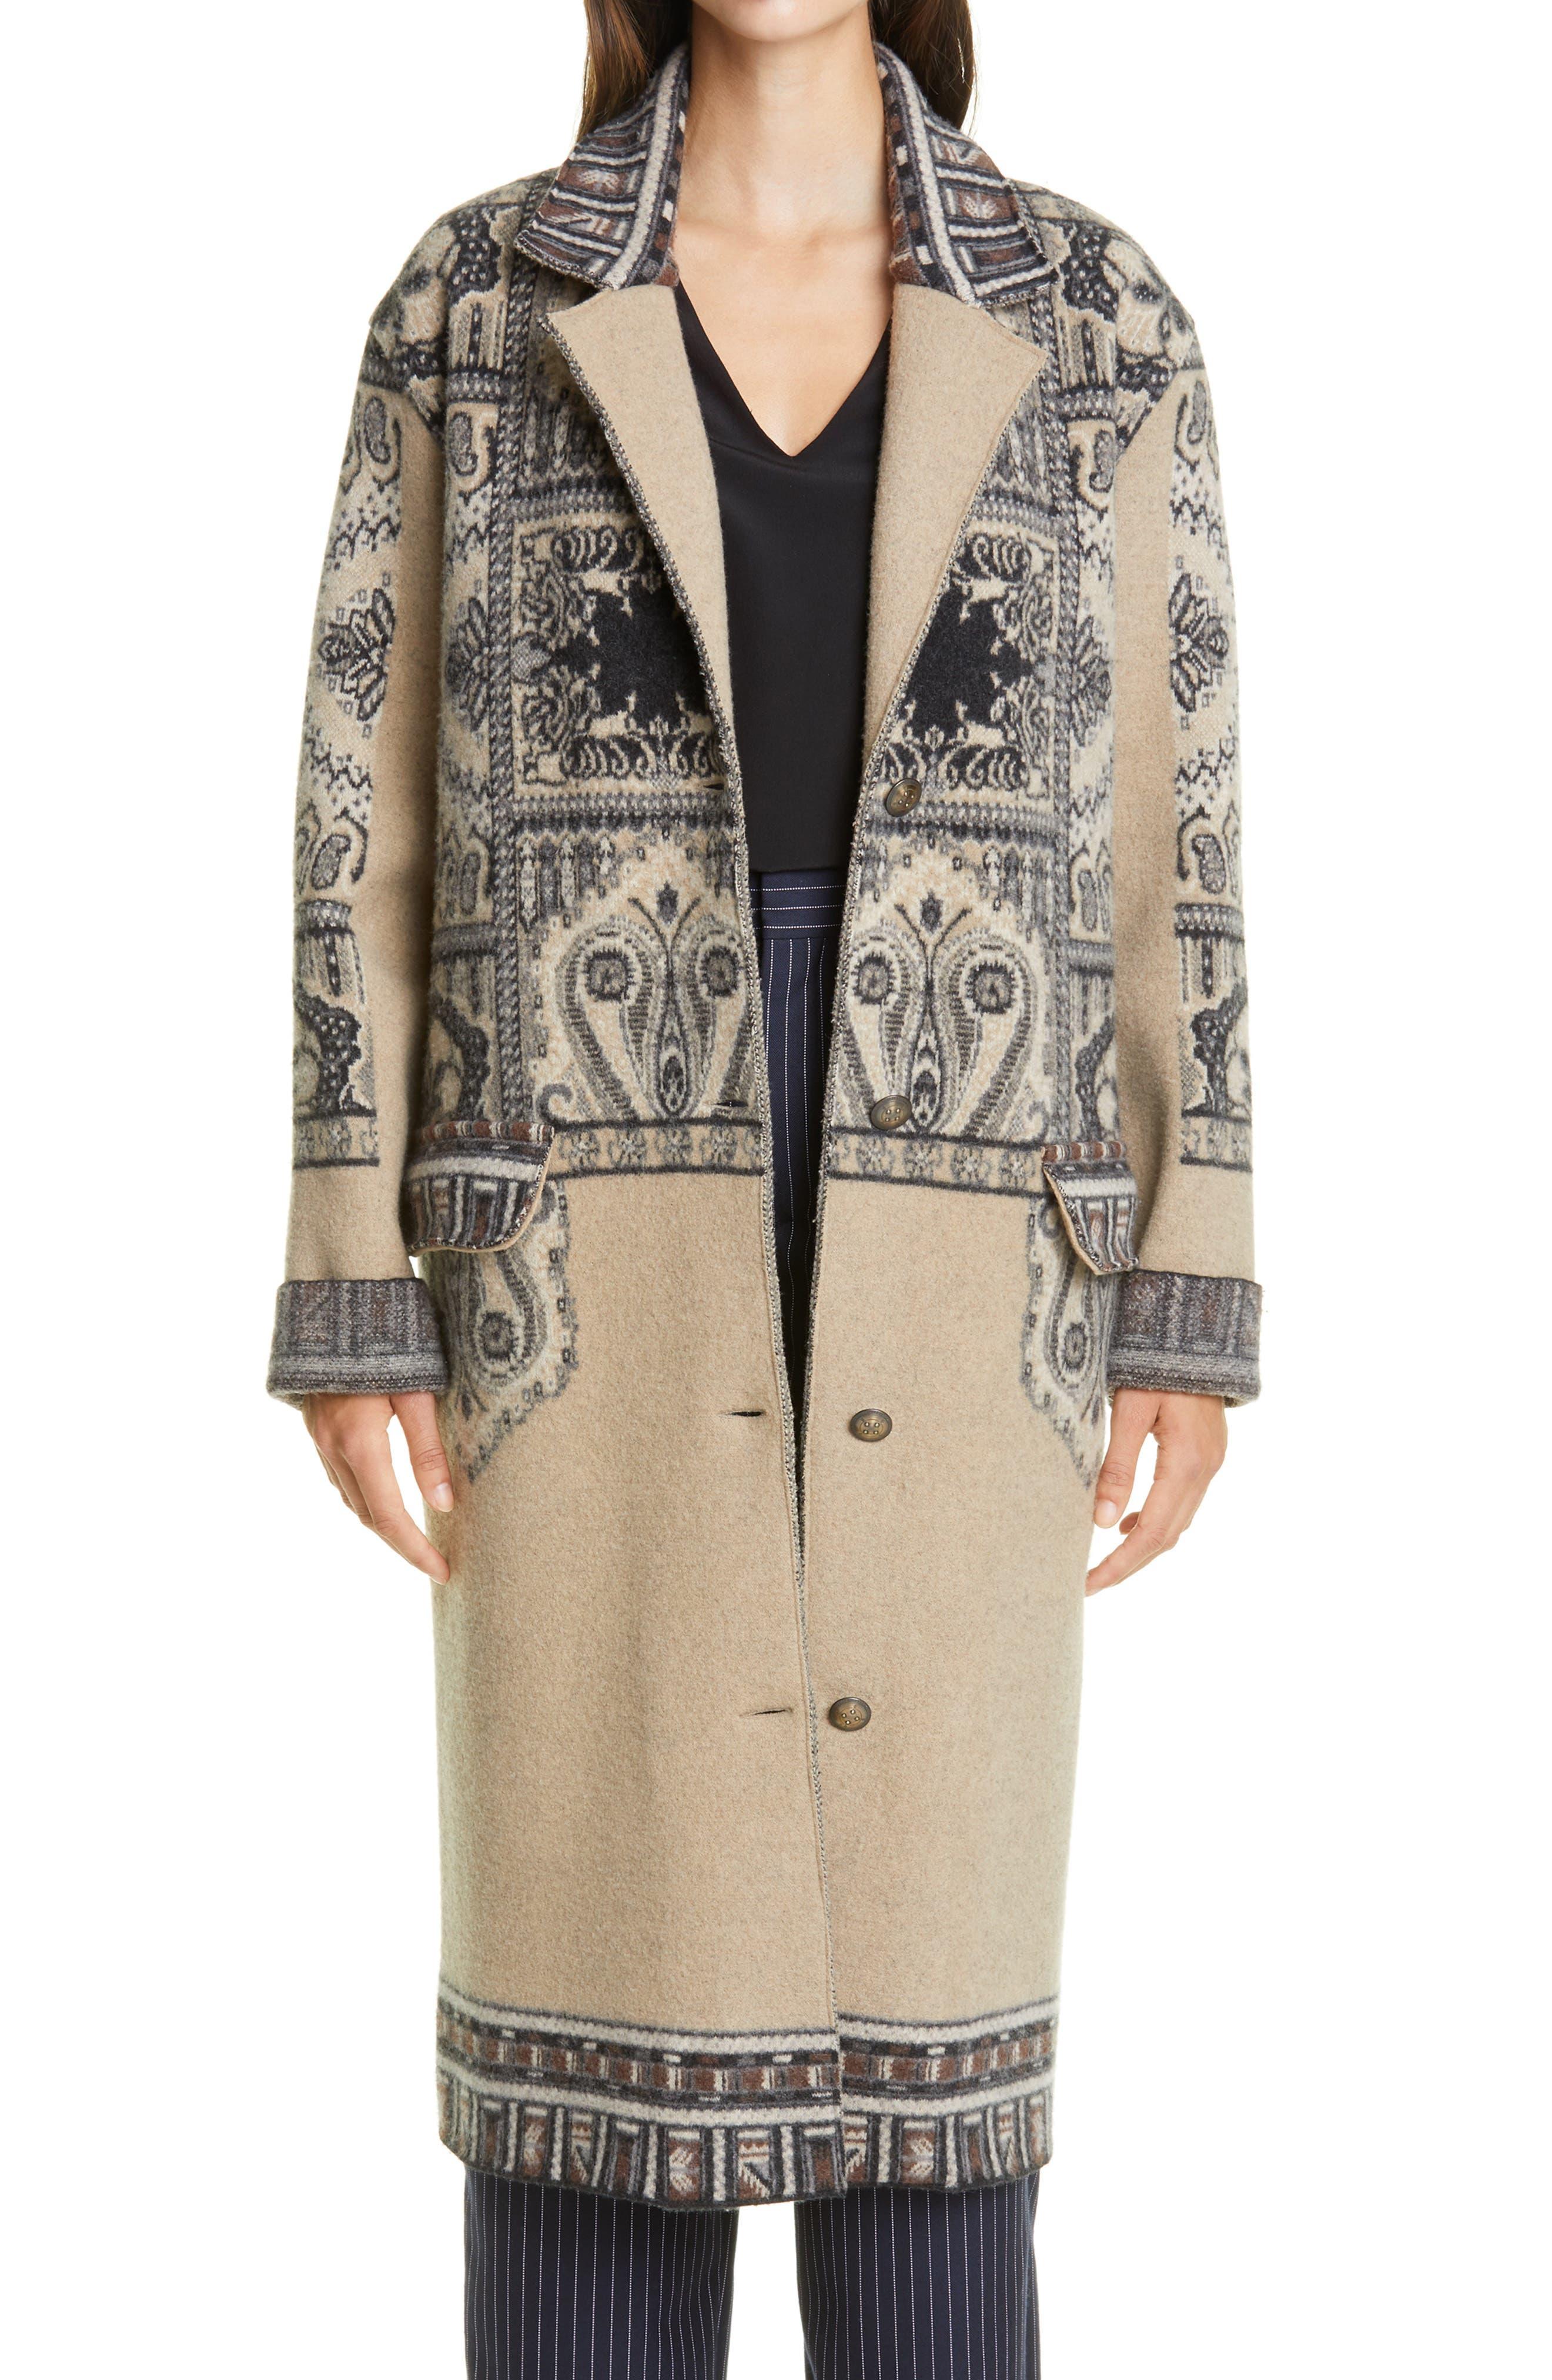 1920s Coats, Flapper Coats, 20s Jackets Womens Etro Print Wool Three-Quarter Coat Size 6 US - Beige $2,720.00 AT vintagedancer.com